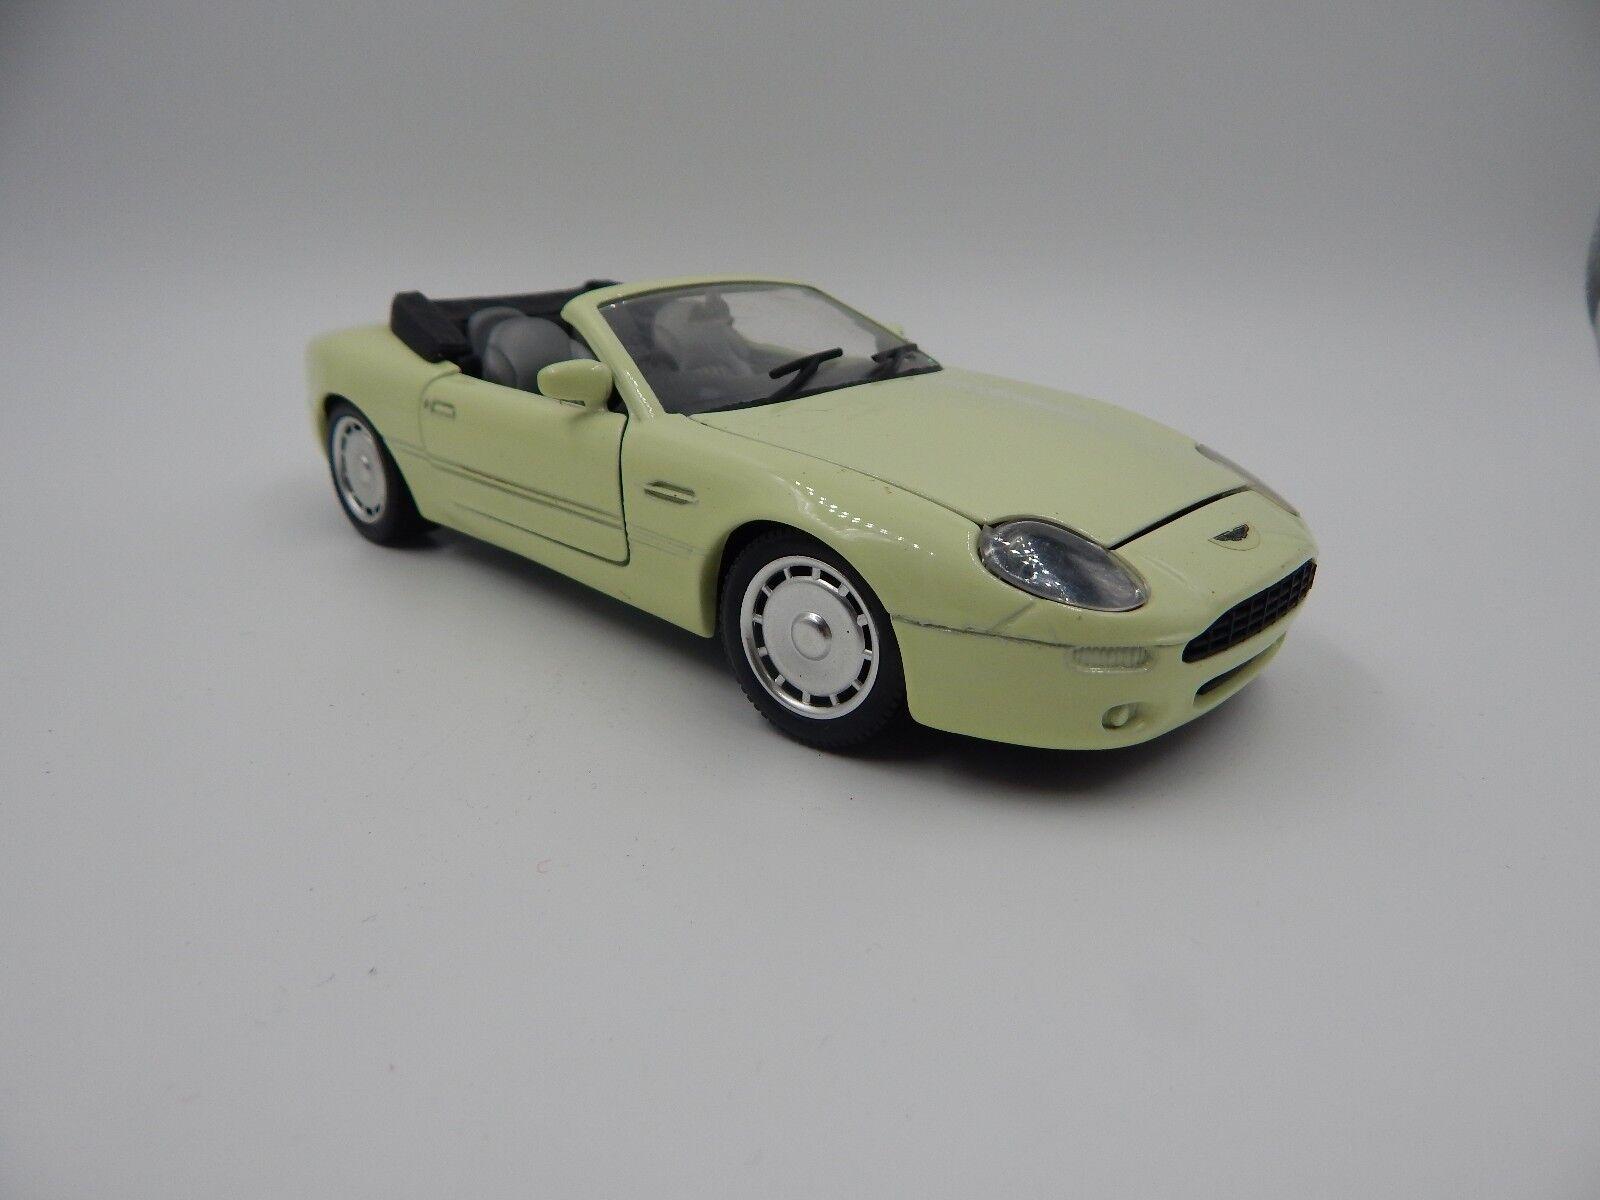 Guiloy Aston Martin DB7 1 24 Die Cast Car 7